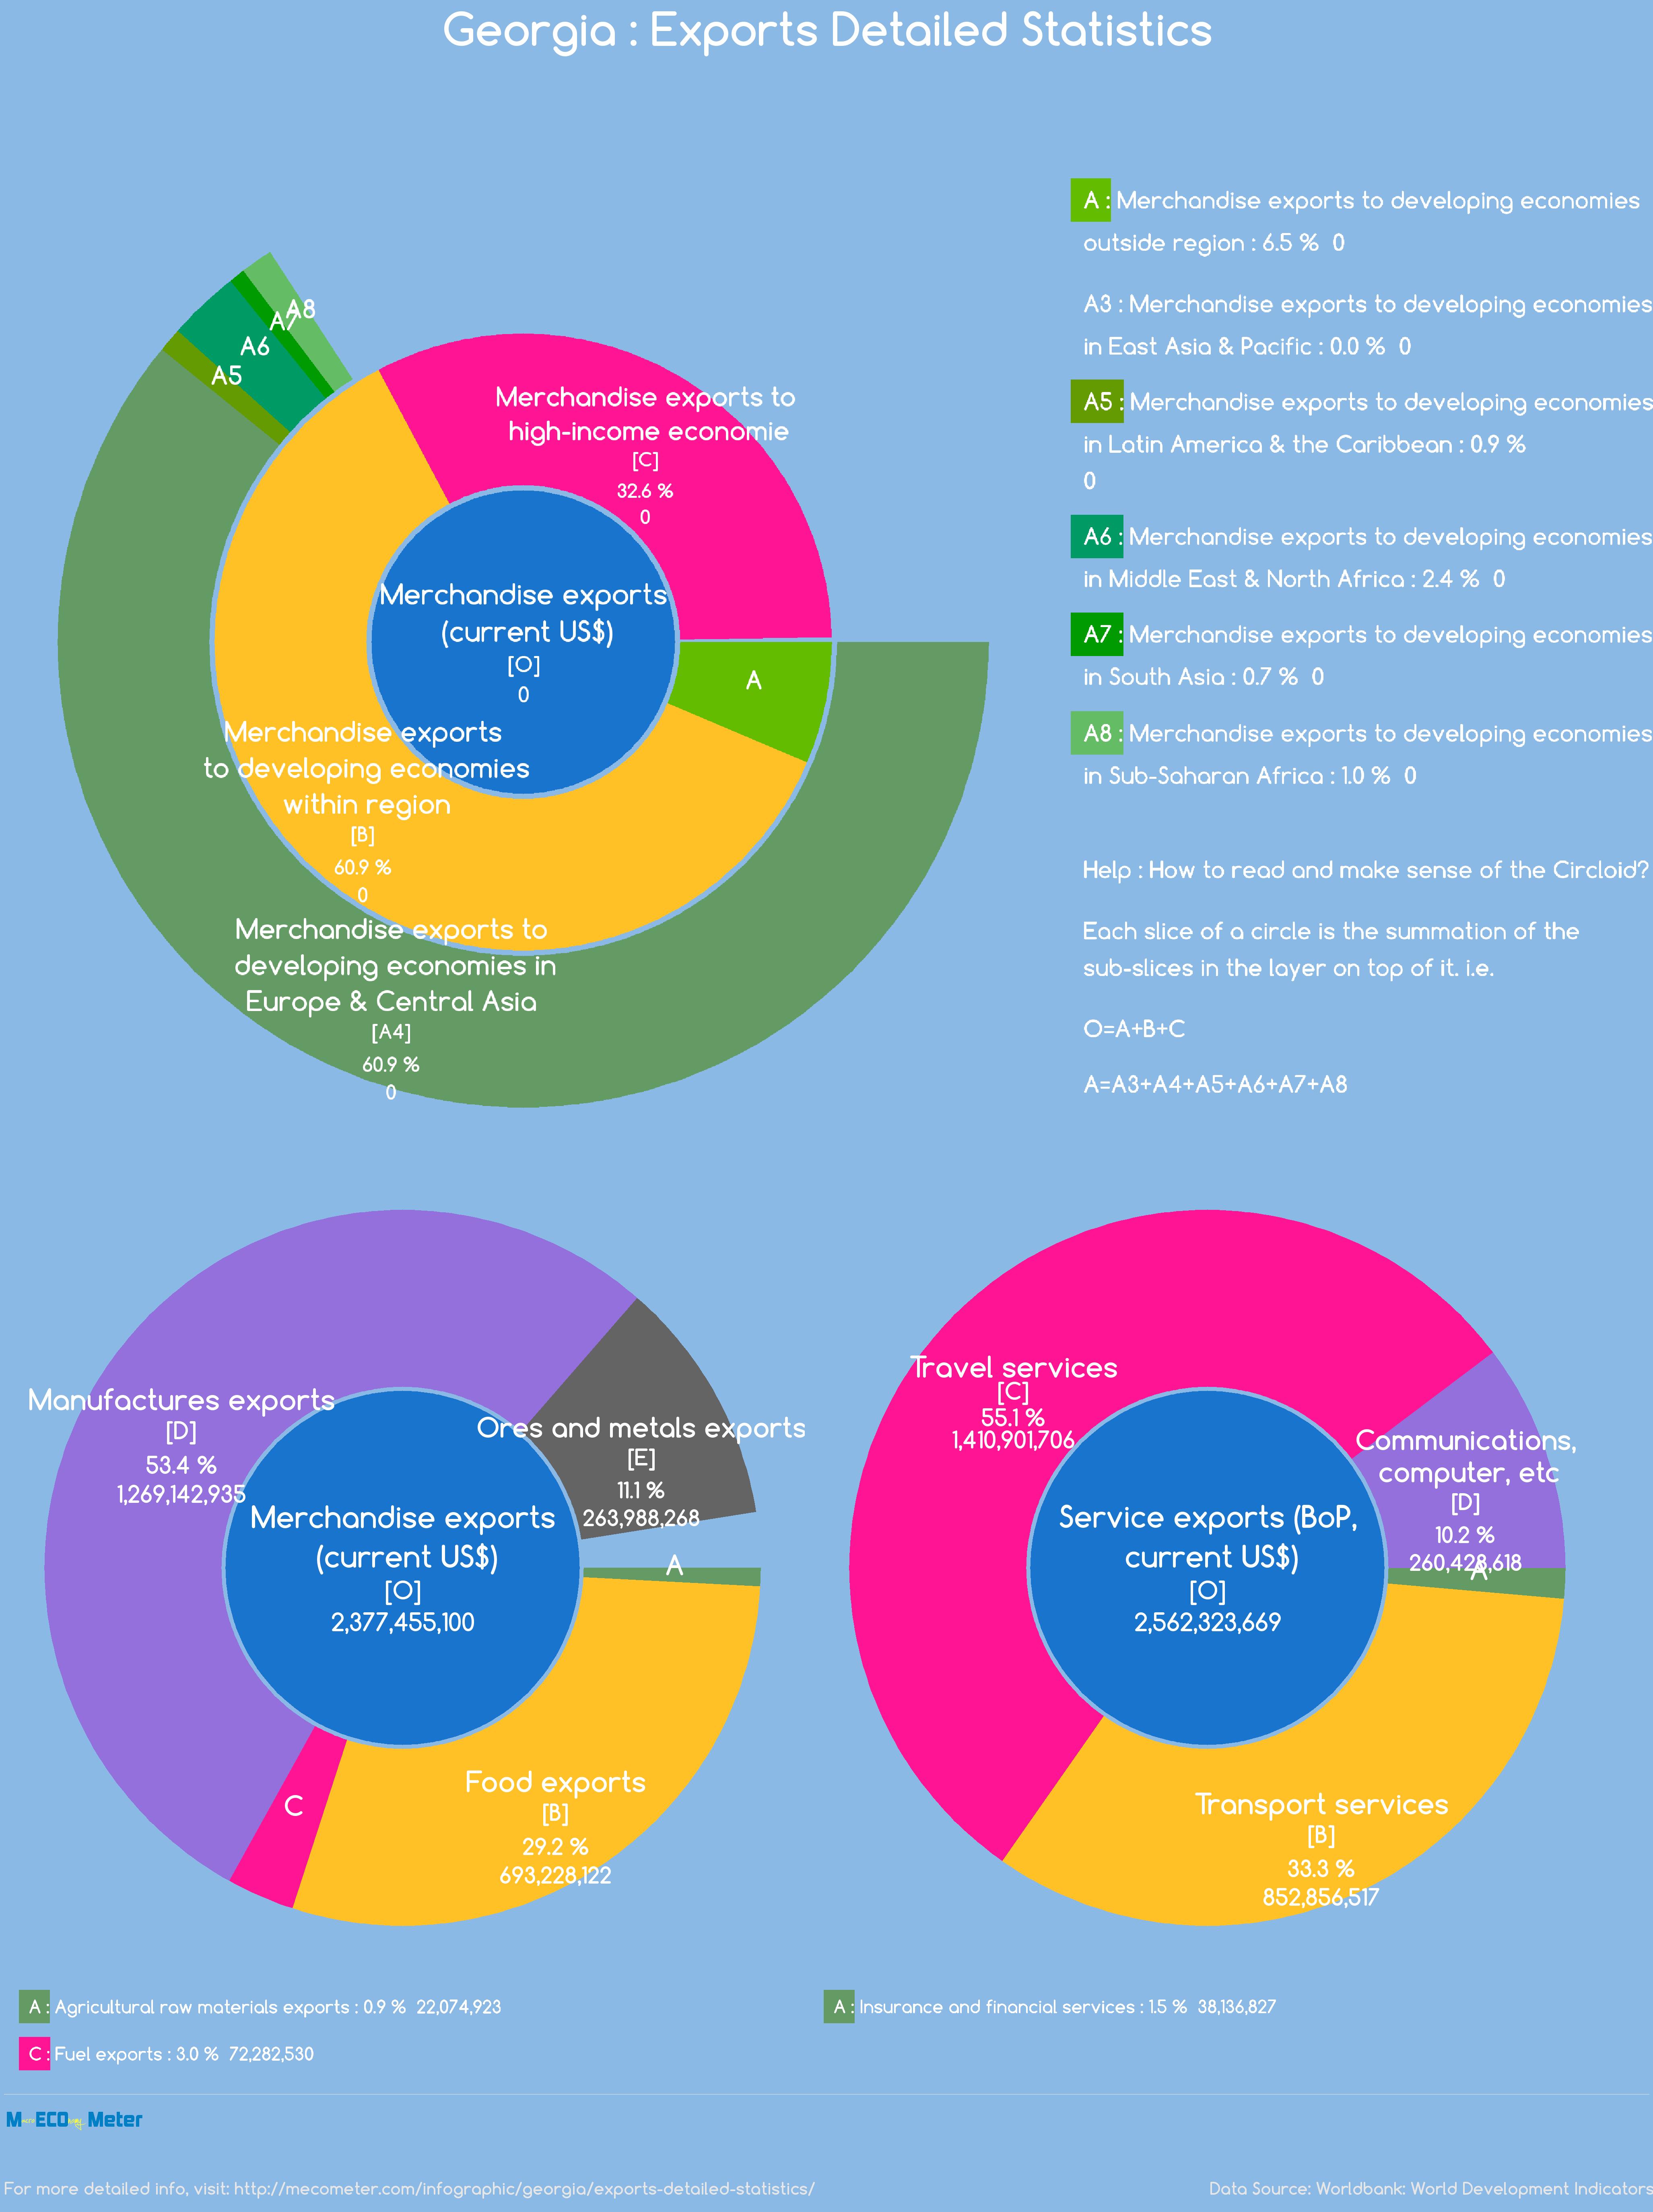 Georgia : Exports Detailed Statistics